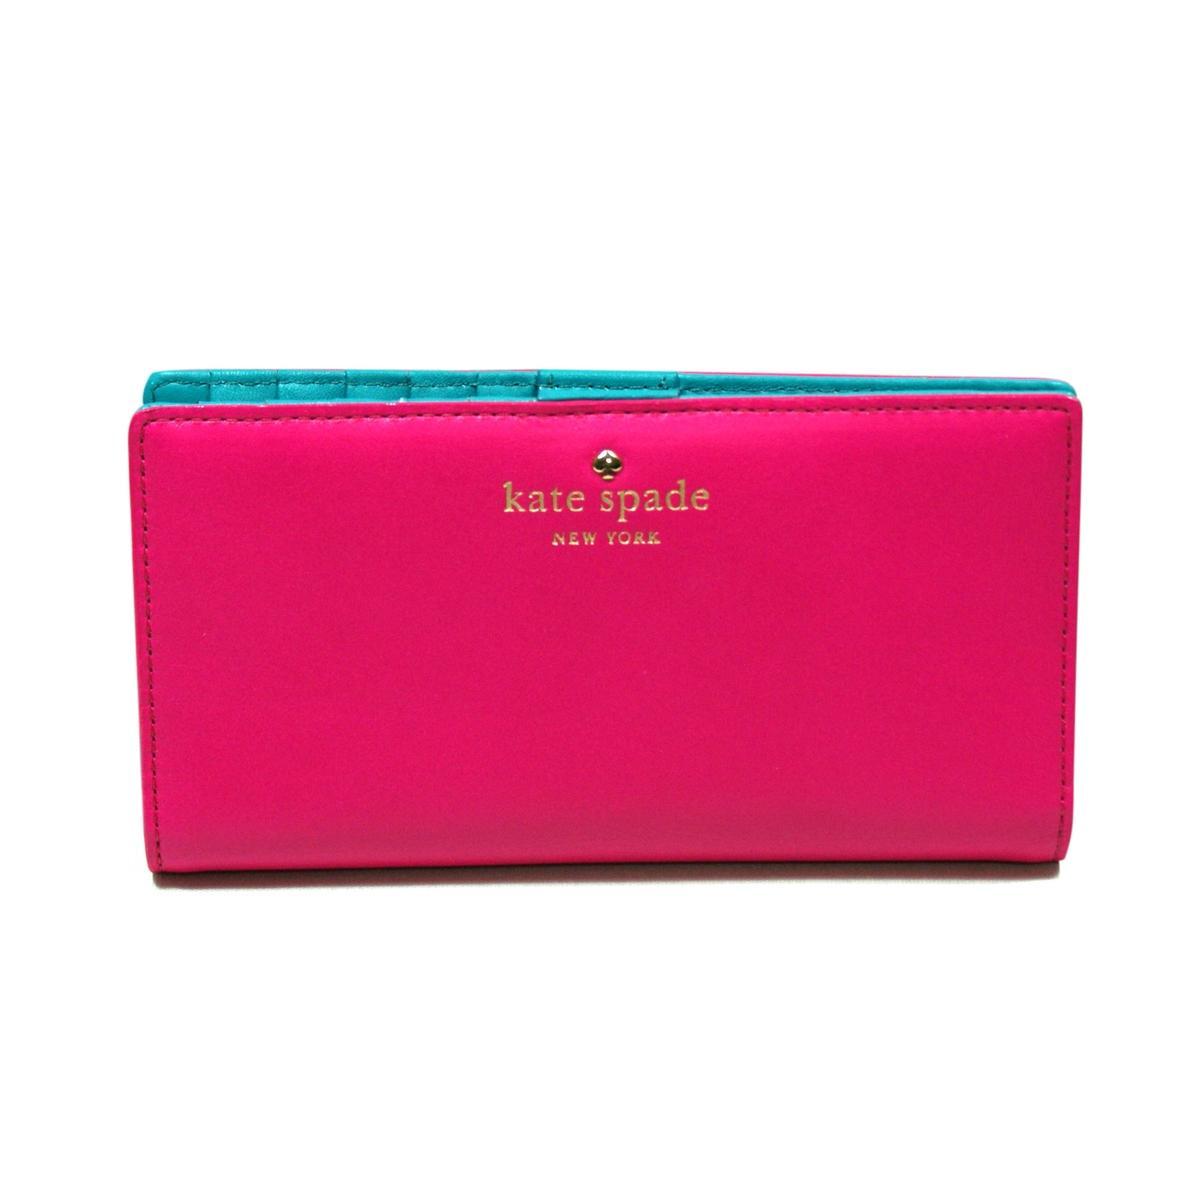 Kate Spade Stacy Brightspot Avenue Peony Pink Small Wallet Clutch Pwru3028 Kate Spade Pwru3028